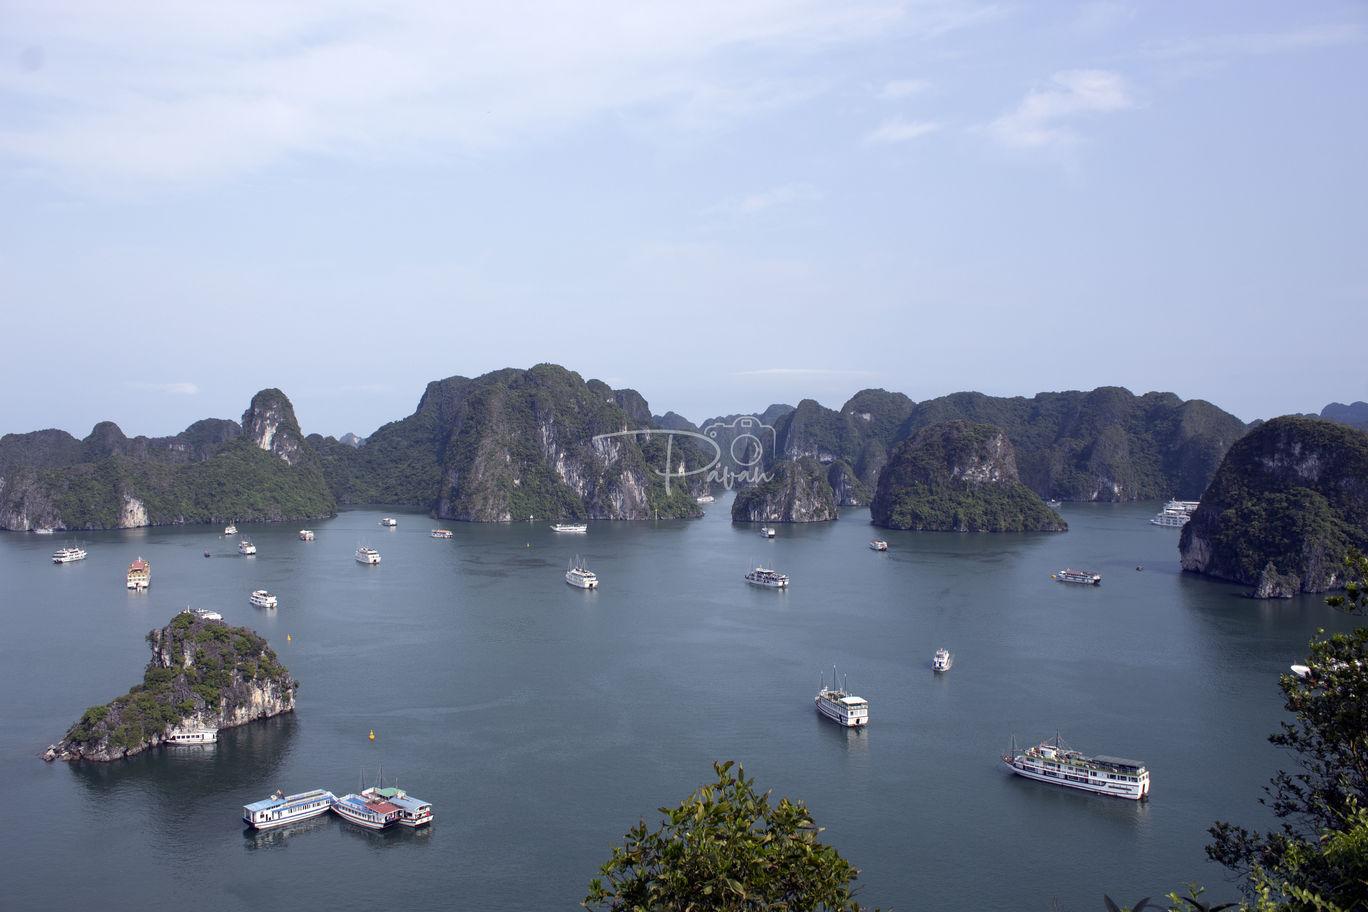 Photo of Hạ Long Bay By Pavan Kumar